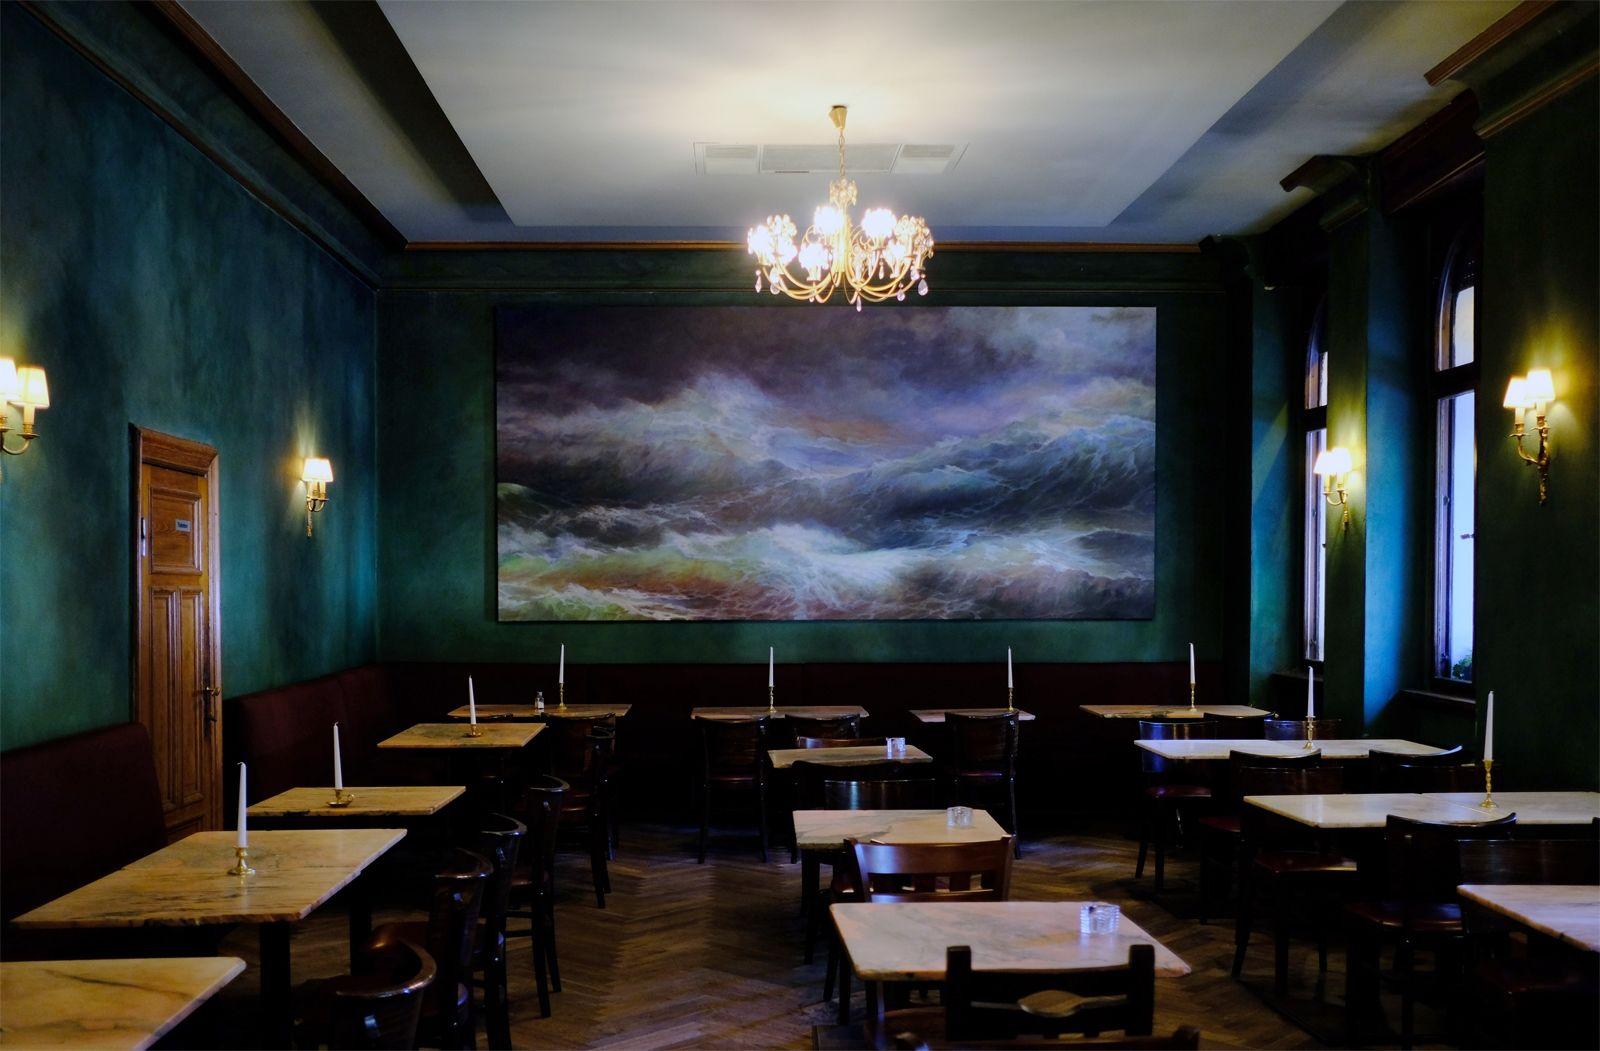 Alpenländische Küche In Berlin Café Restaurant Jolesch